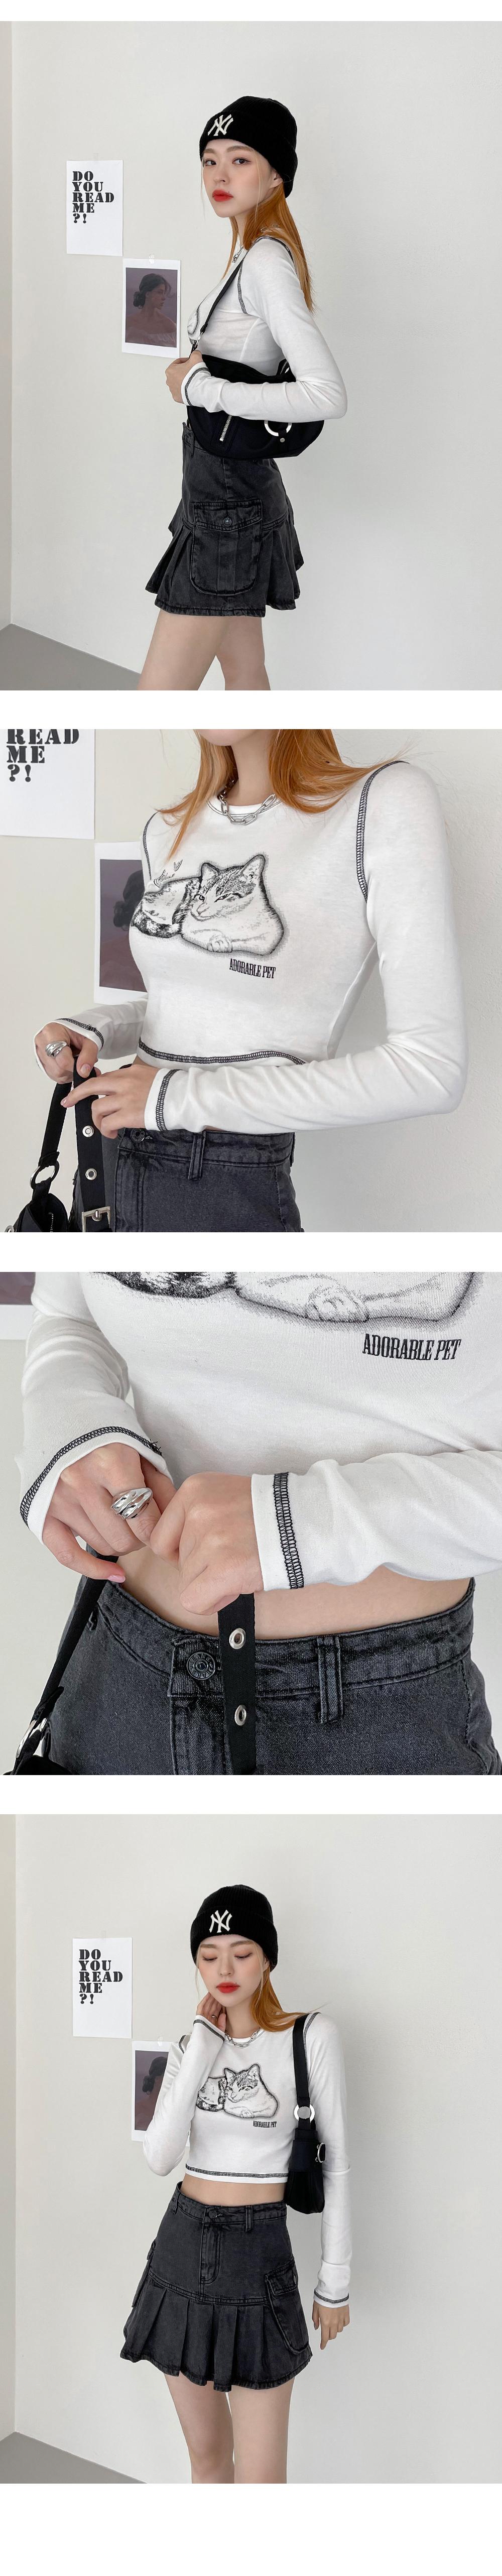 Katz stitch cropped long-sleeved T-shirt